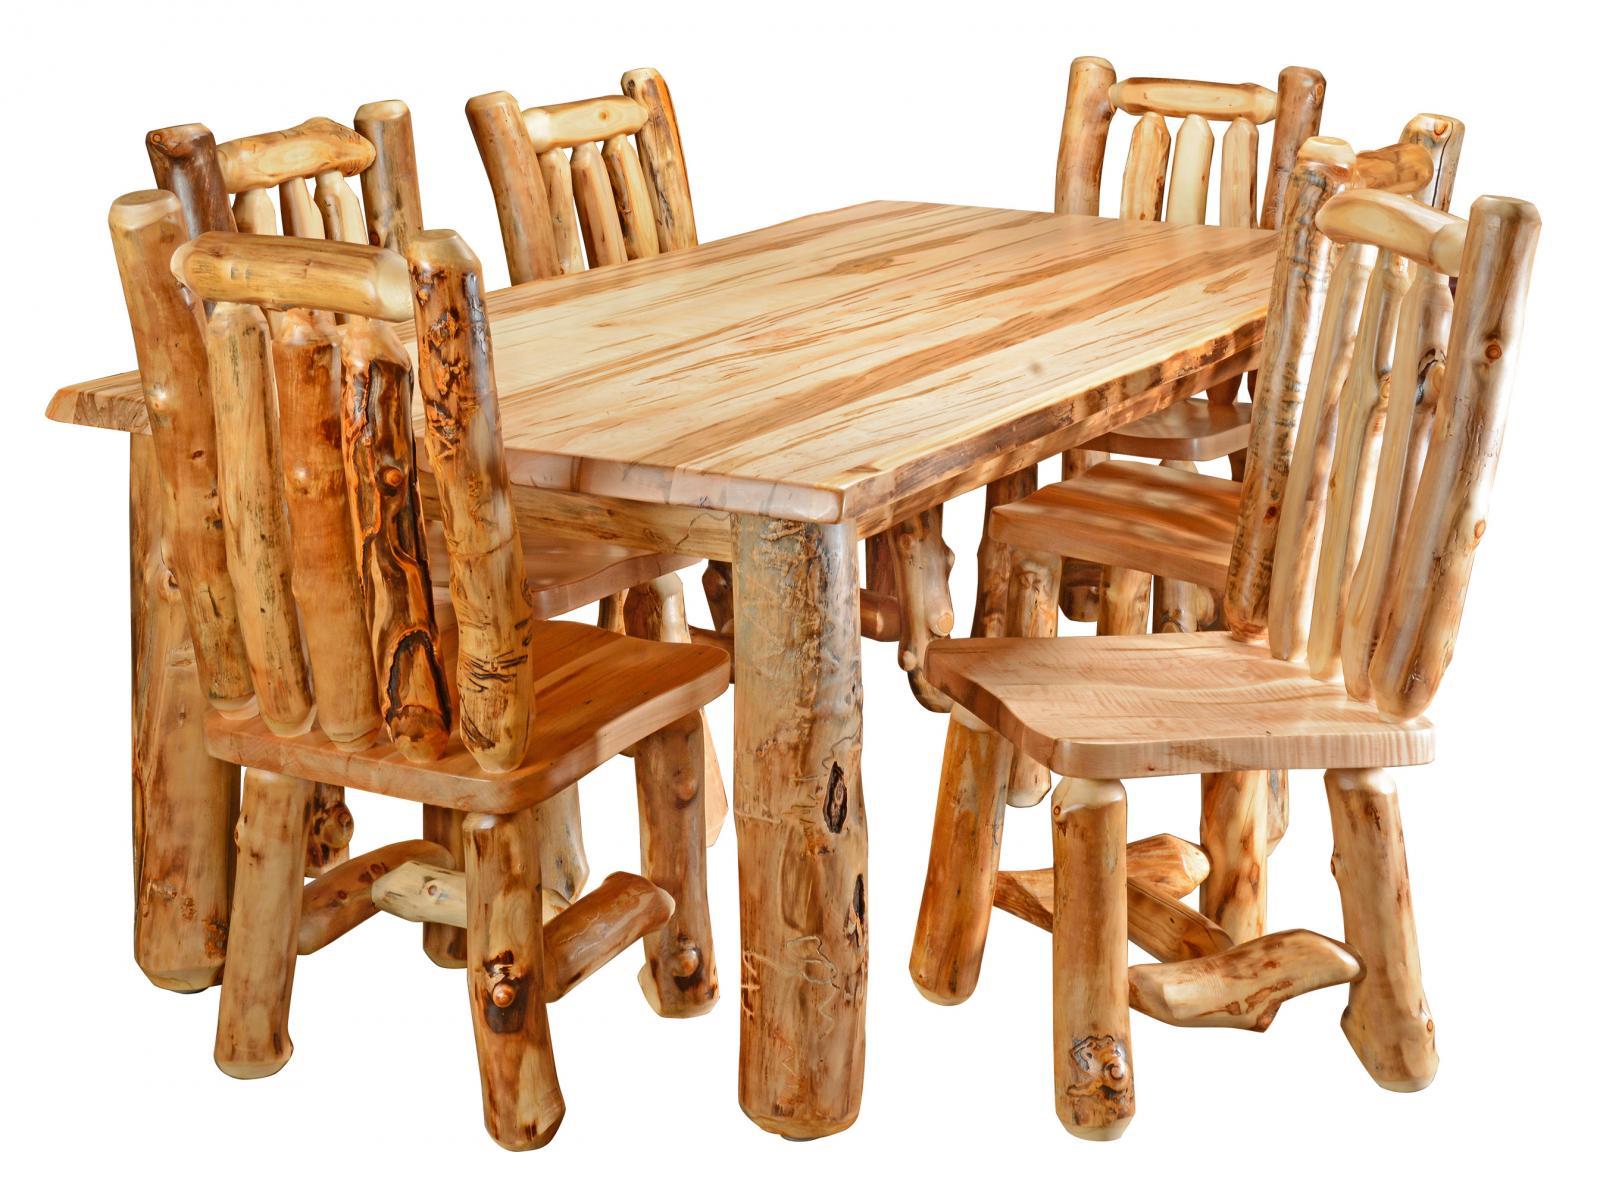 dorel living da6577 rustic wood - 28 images - dorel living dorel living cassy multifunction ...